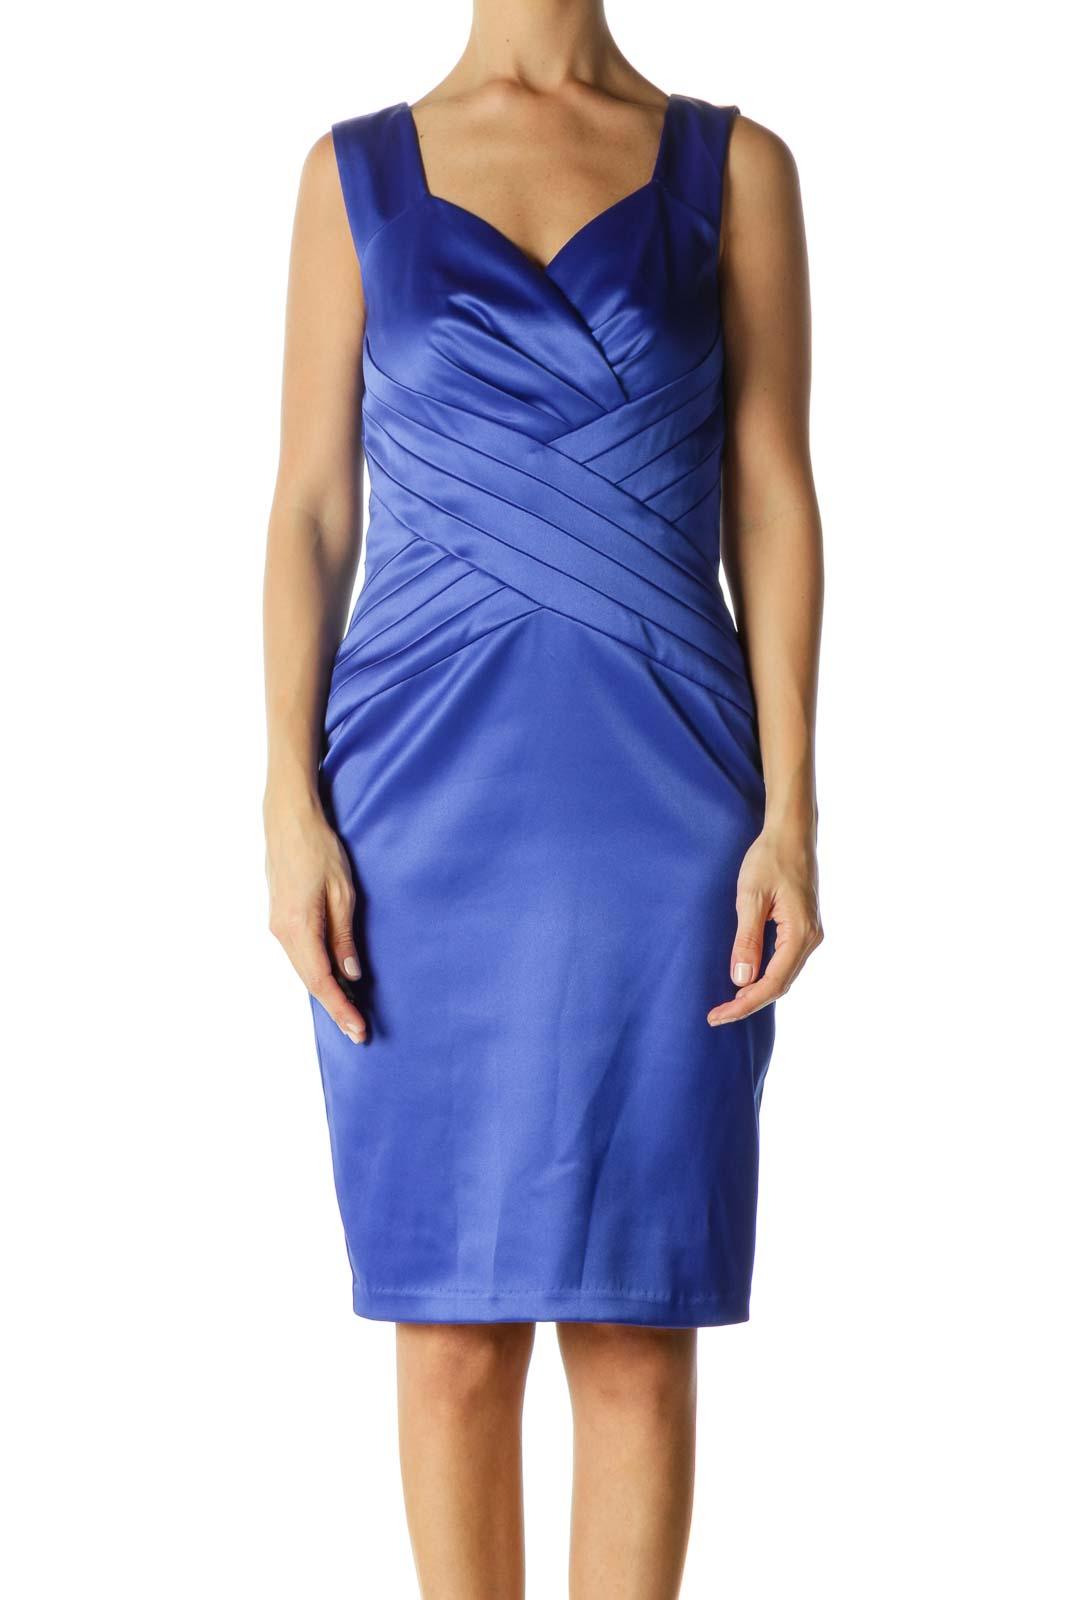 Blue Shiny Shift Dress Front